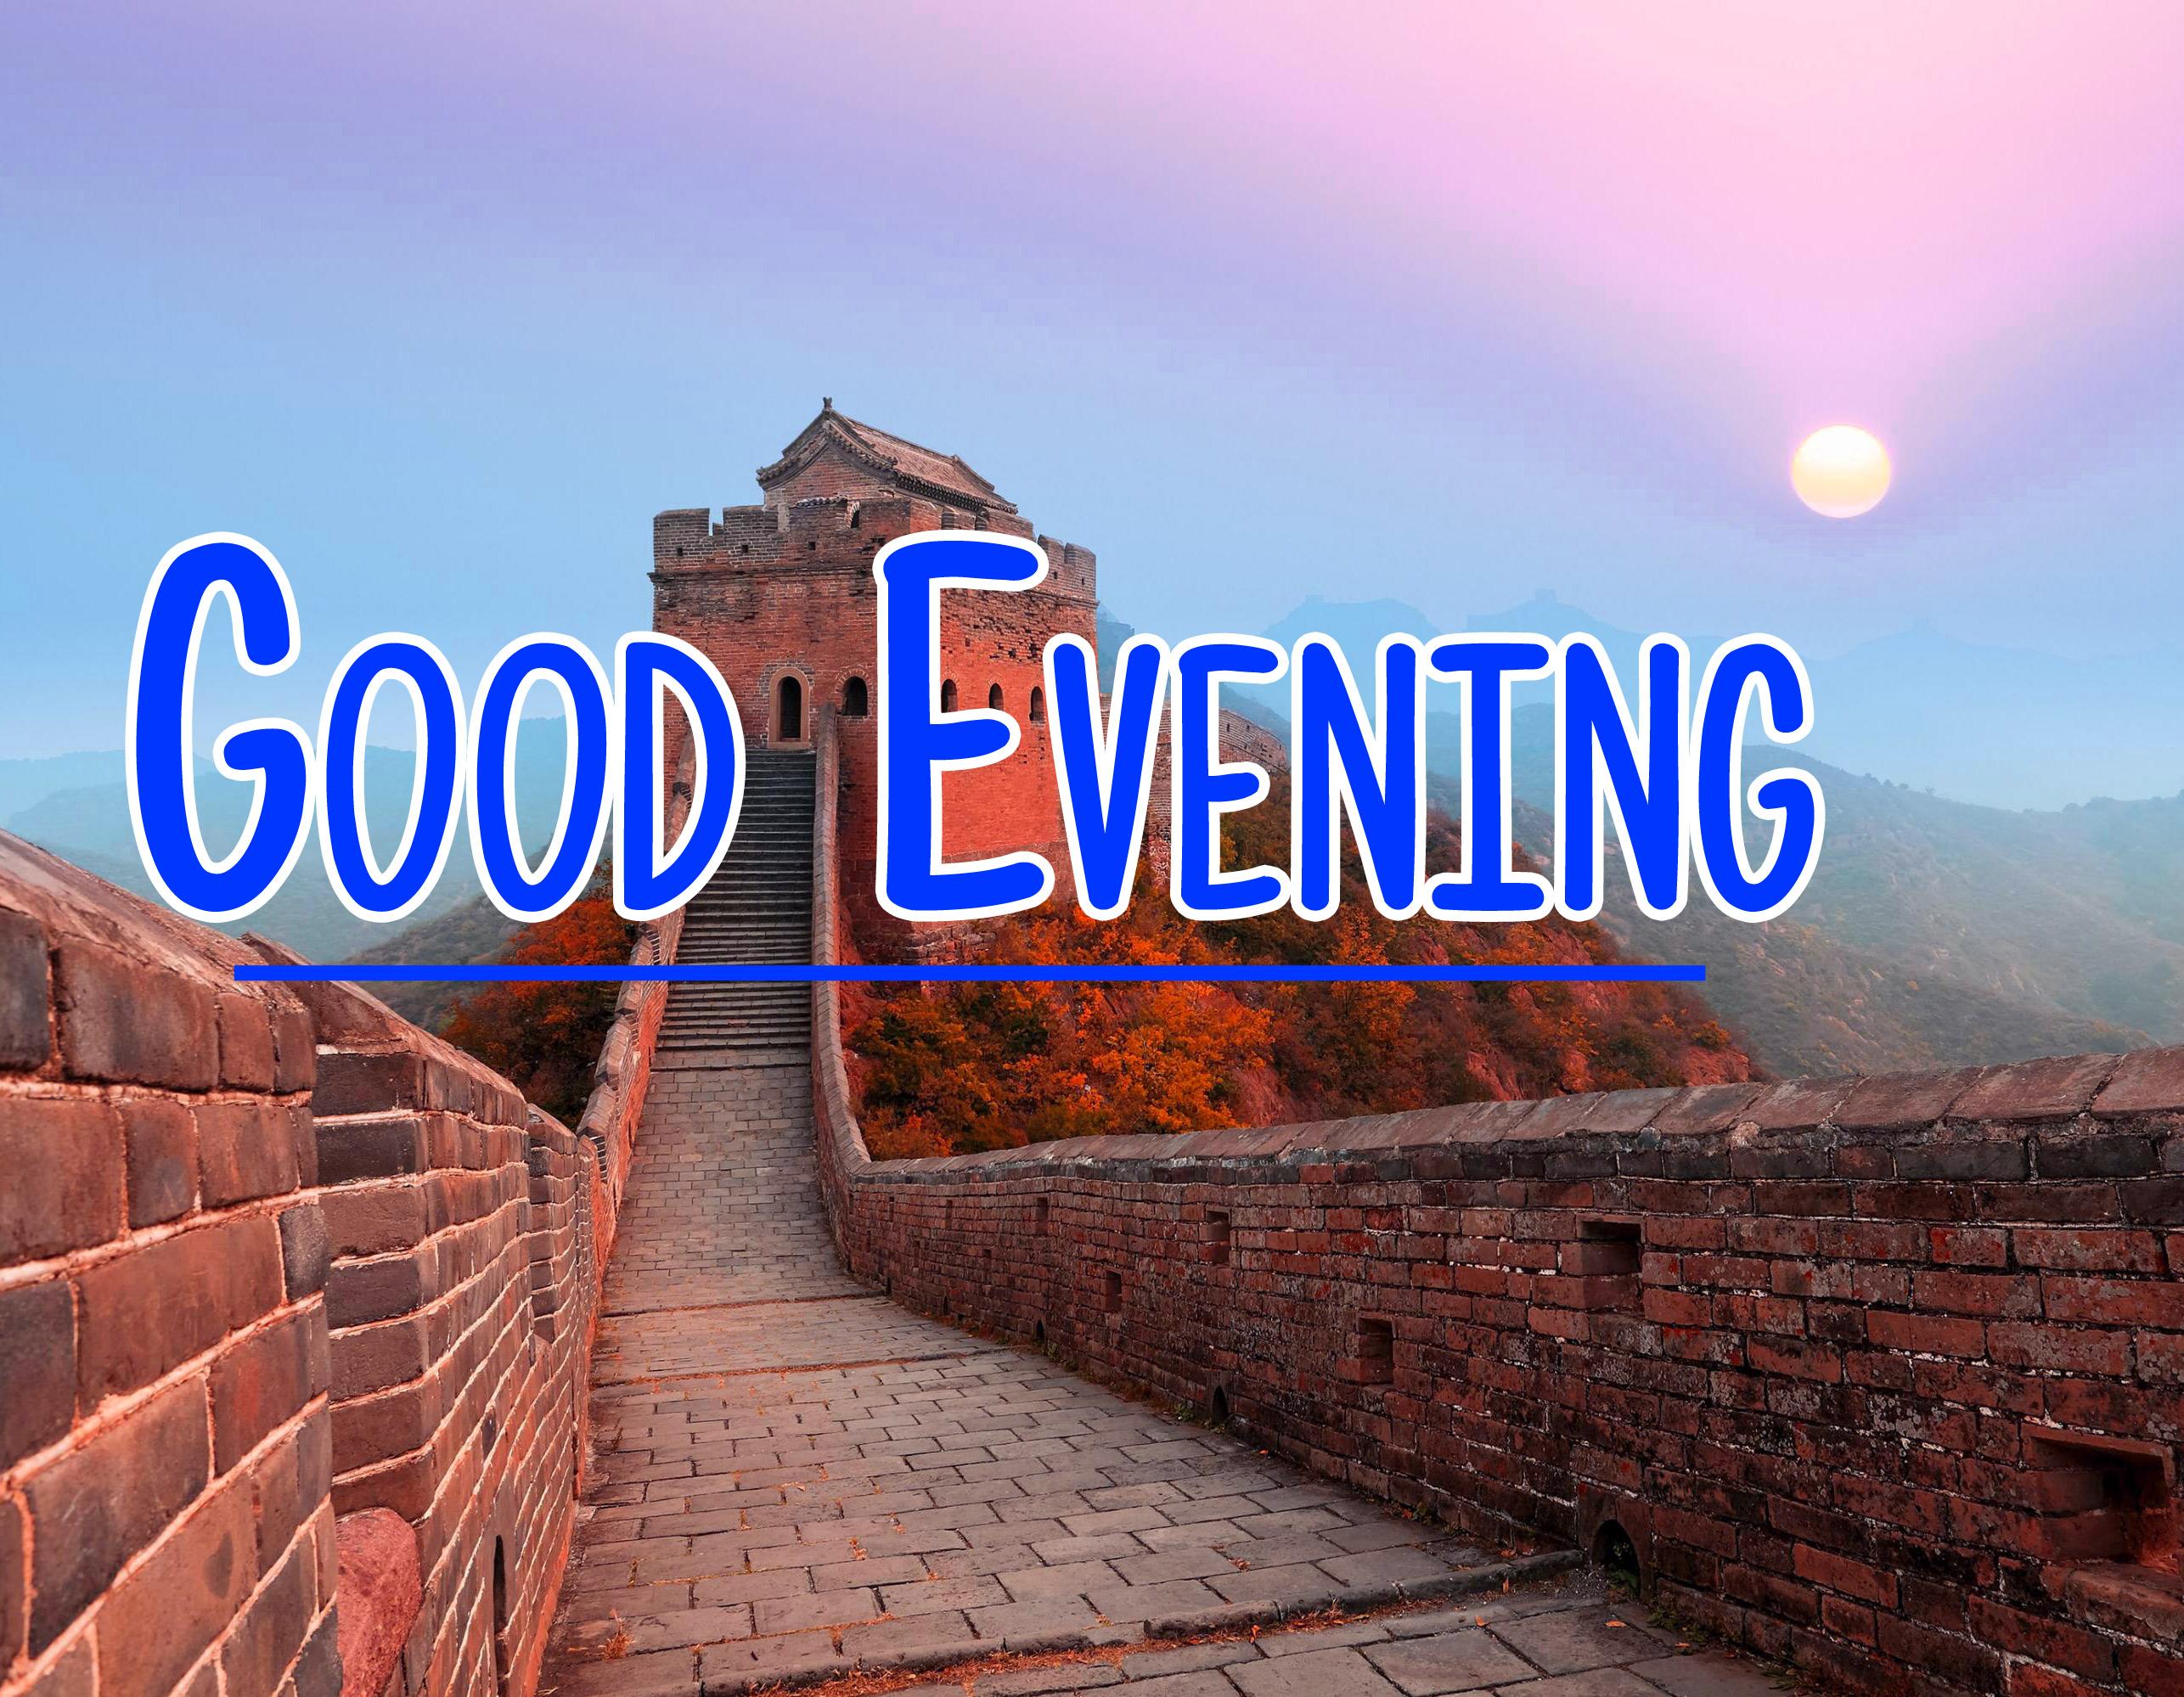 good evening photo 13